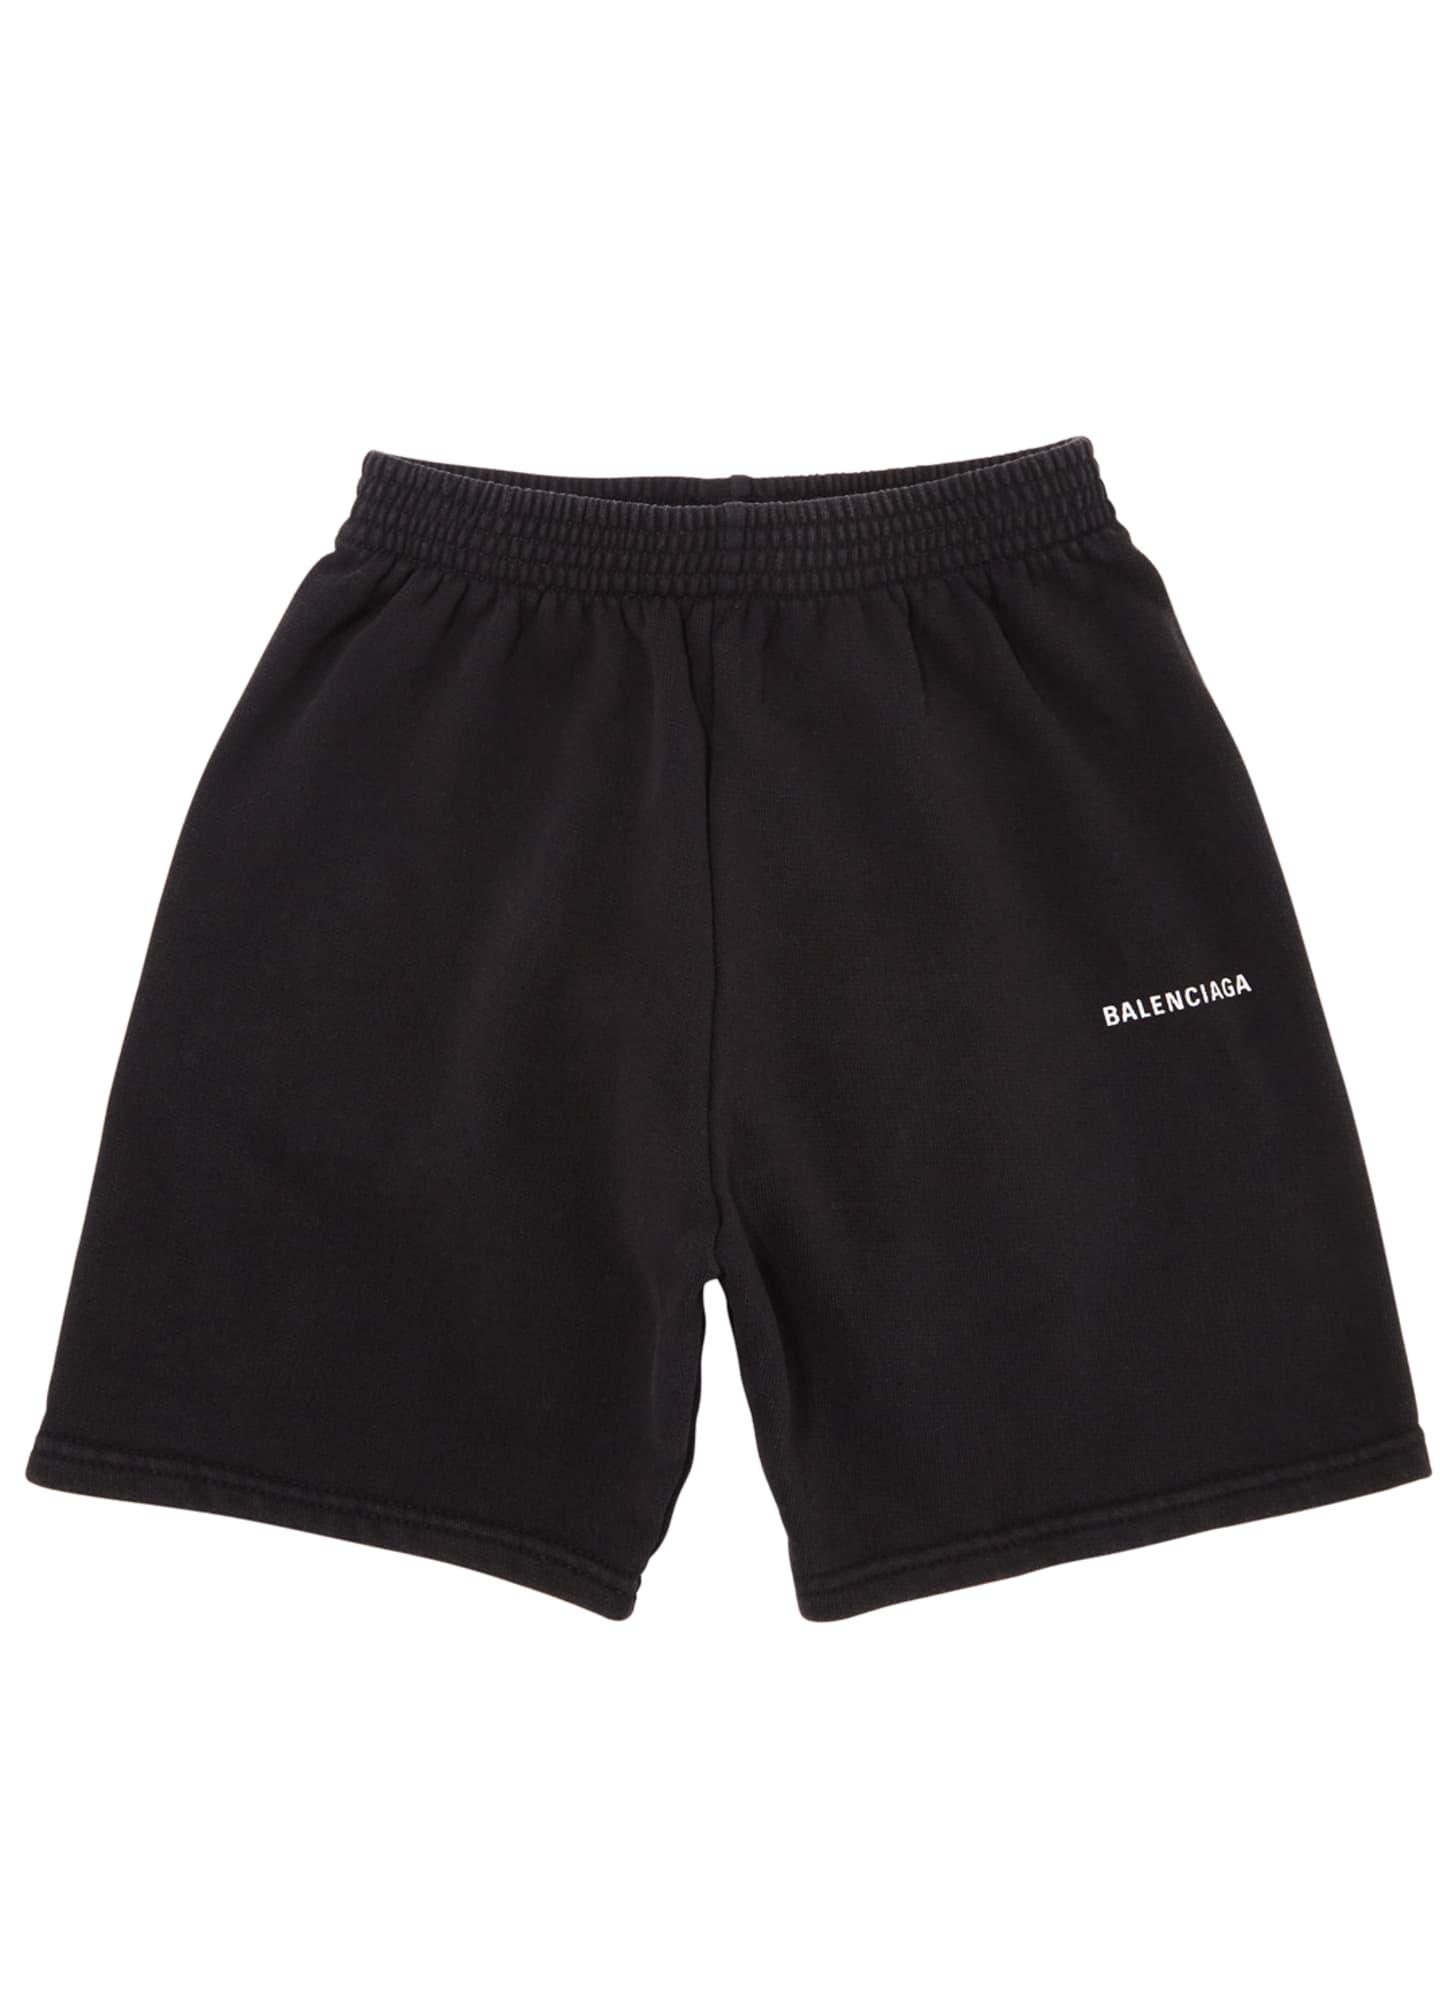 Balenciaga Kid's Jogging Shorts, Size 2-10